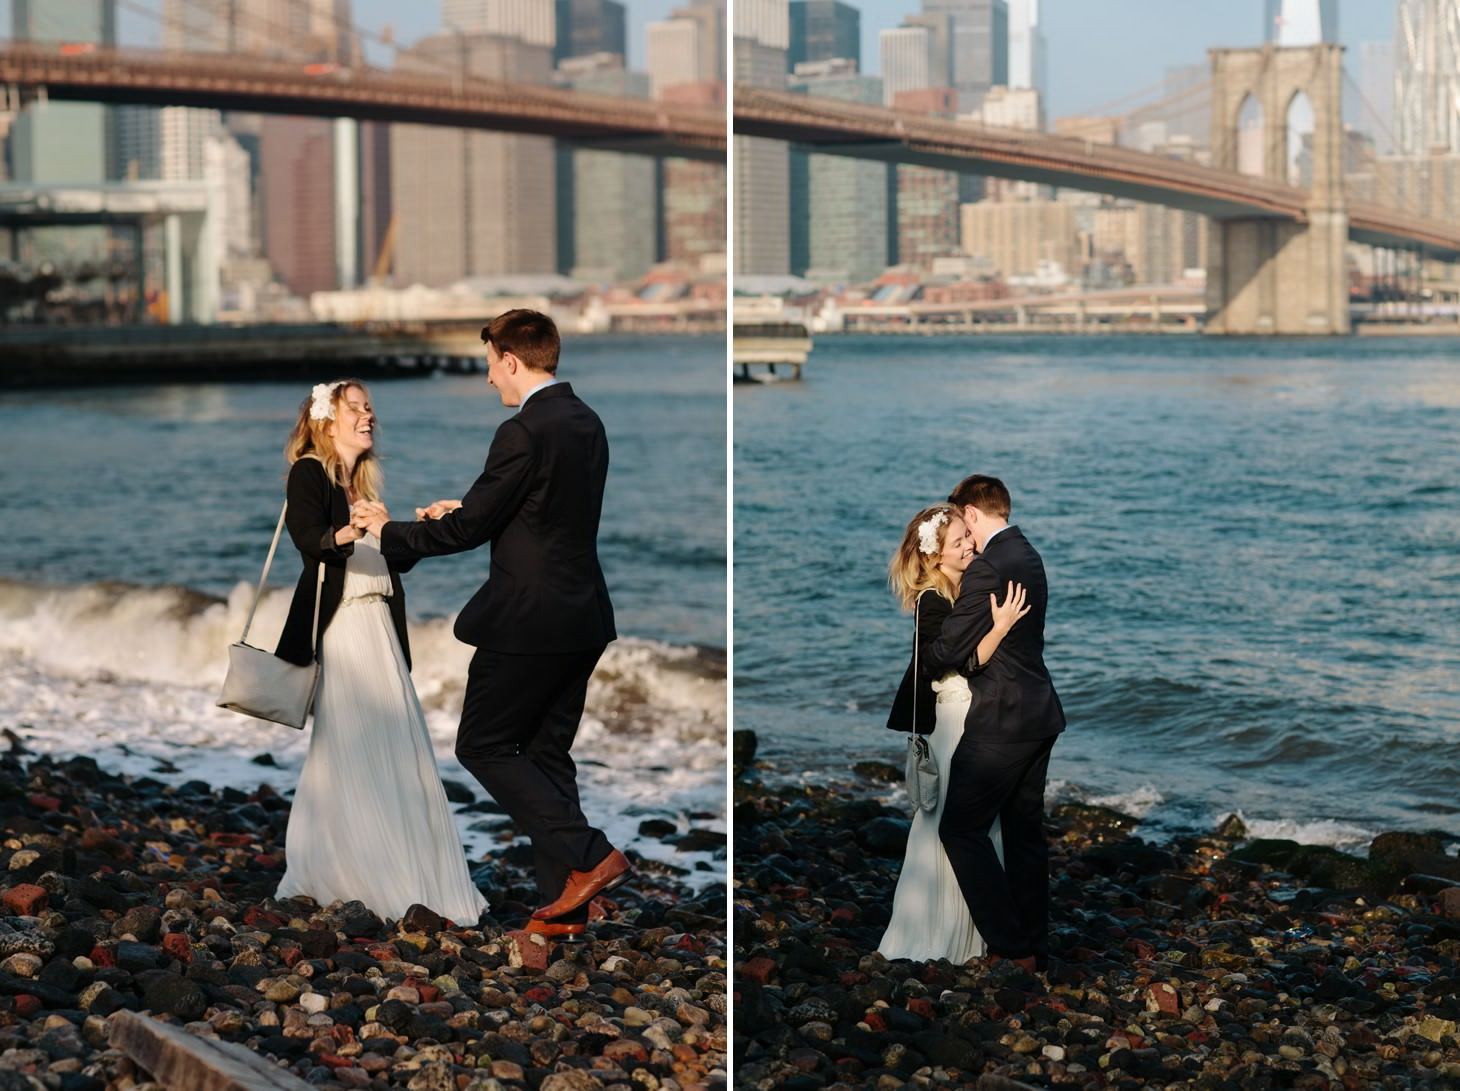 nyc-wedding-photographer-brooklyn-bridge-smitten-chickens-photo007.jpg